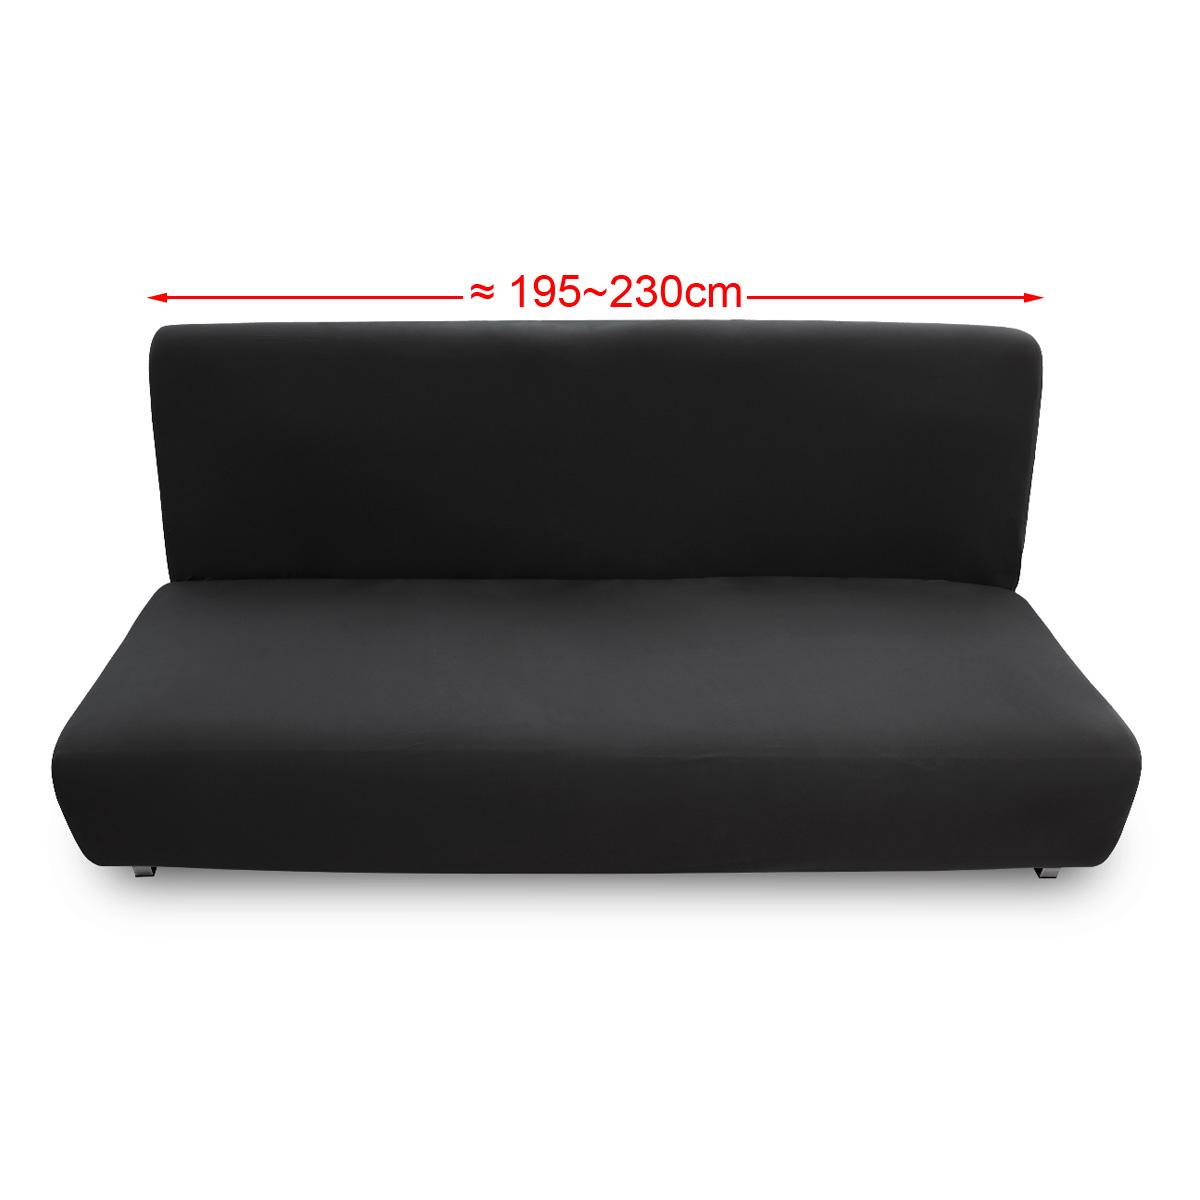 Full Size of Sofa Spannbezug Stretch Sofaberwurf Sesselbezug Sofabezge Hussen Xxxl Bezug Höffner Big Schlafsofa Liegefläche 160x200 Mit Hocker Rolf Benz Graues Sofa Sofa Spannbezug